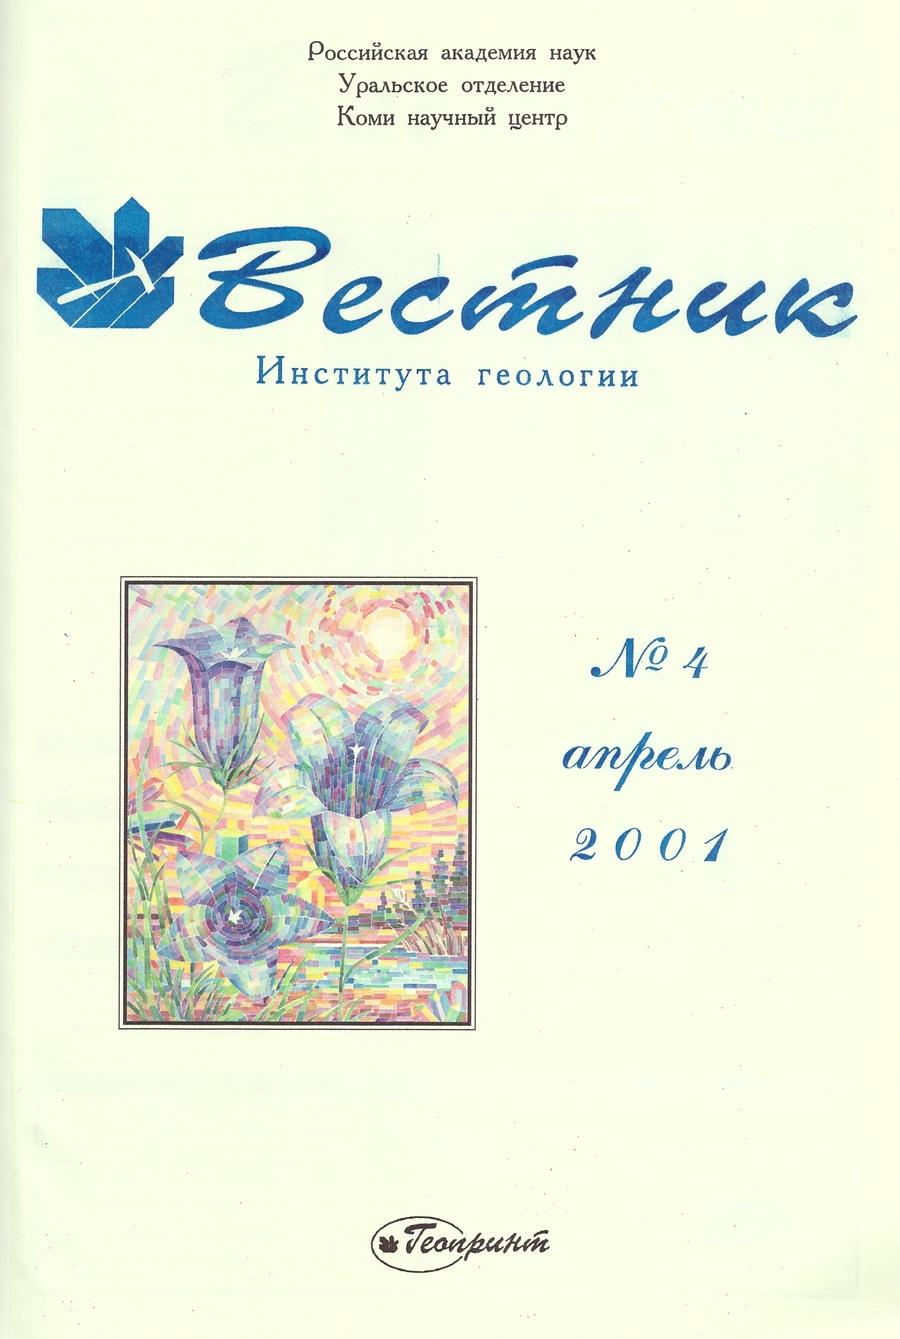 № 76, апрель